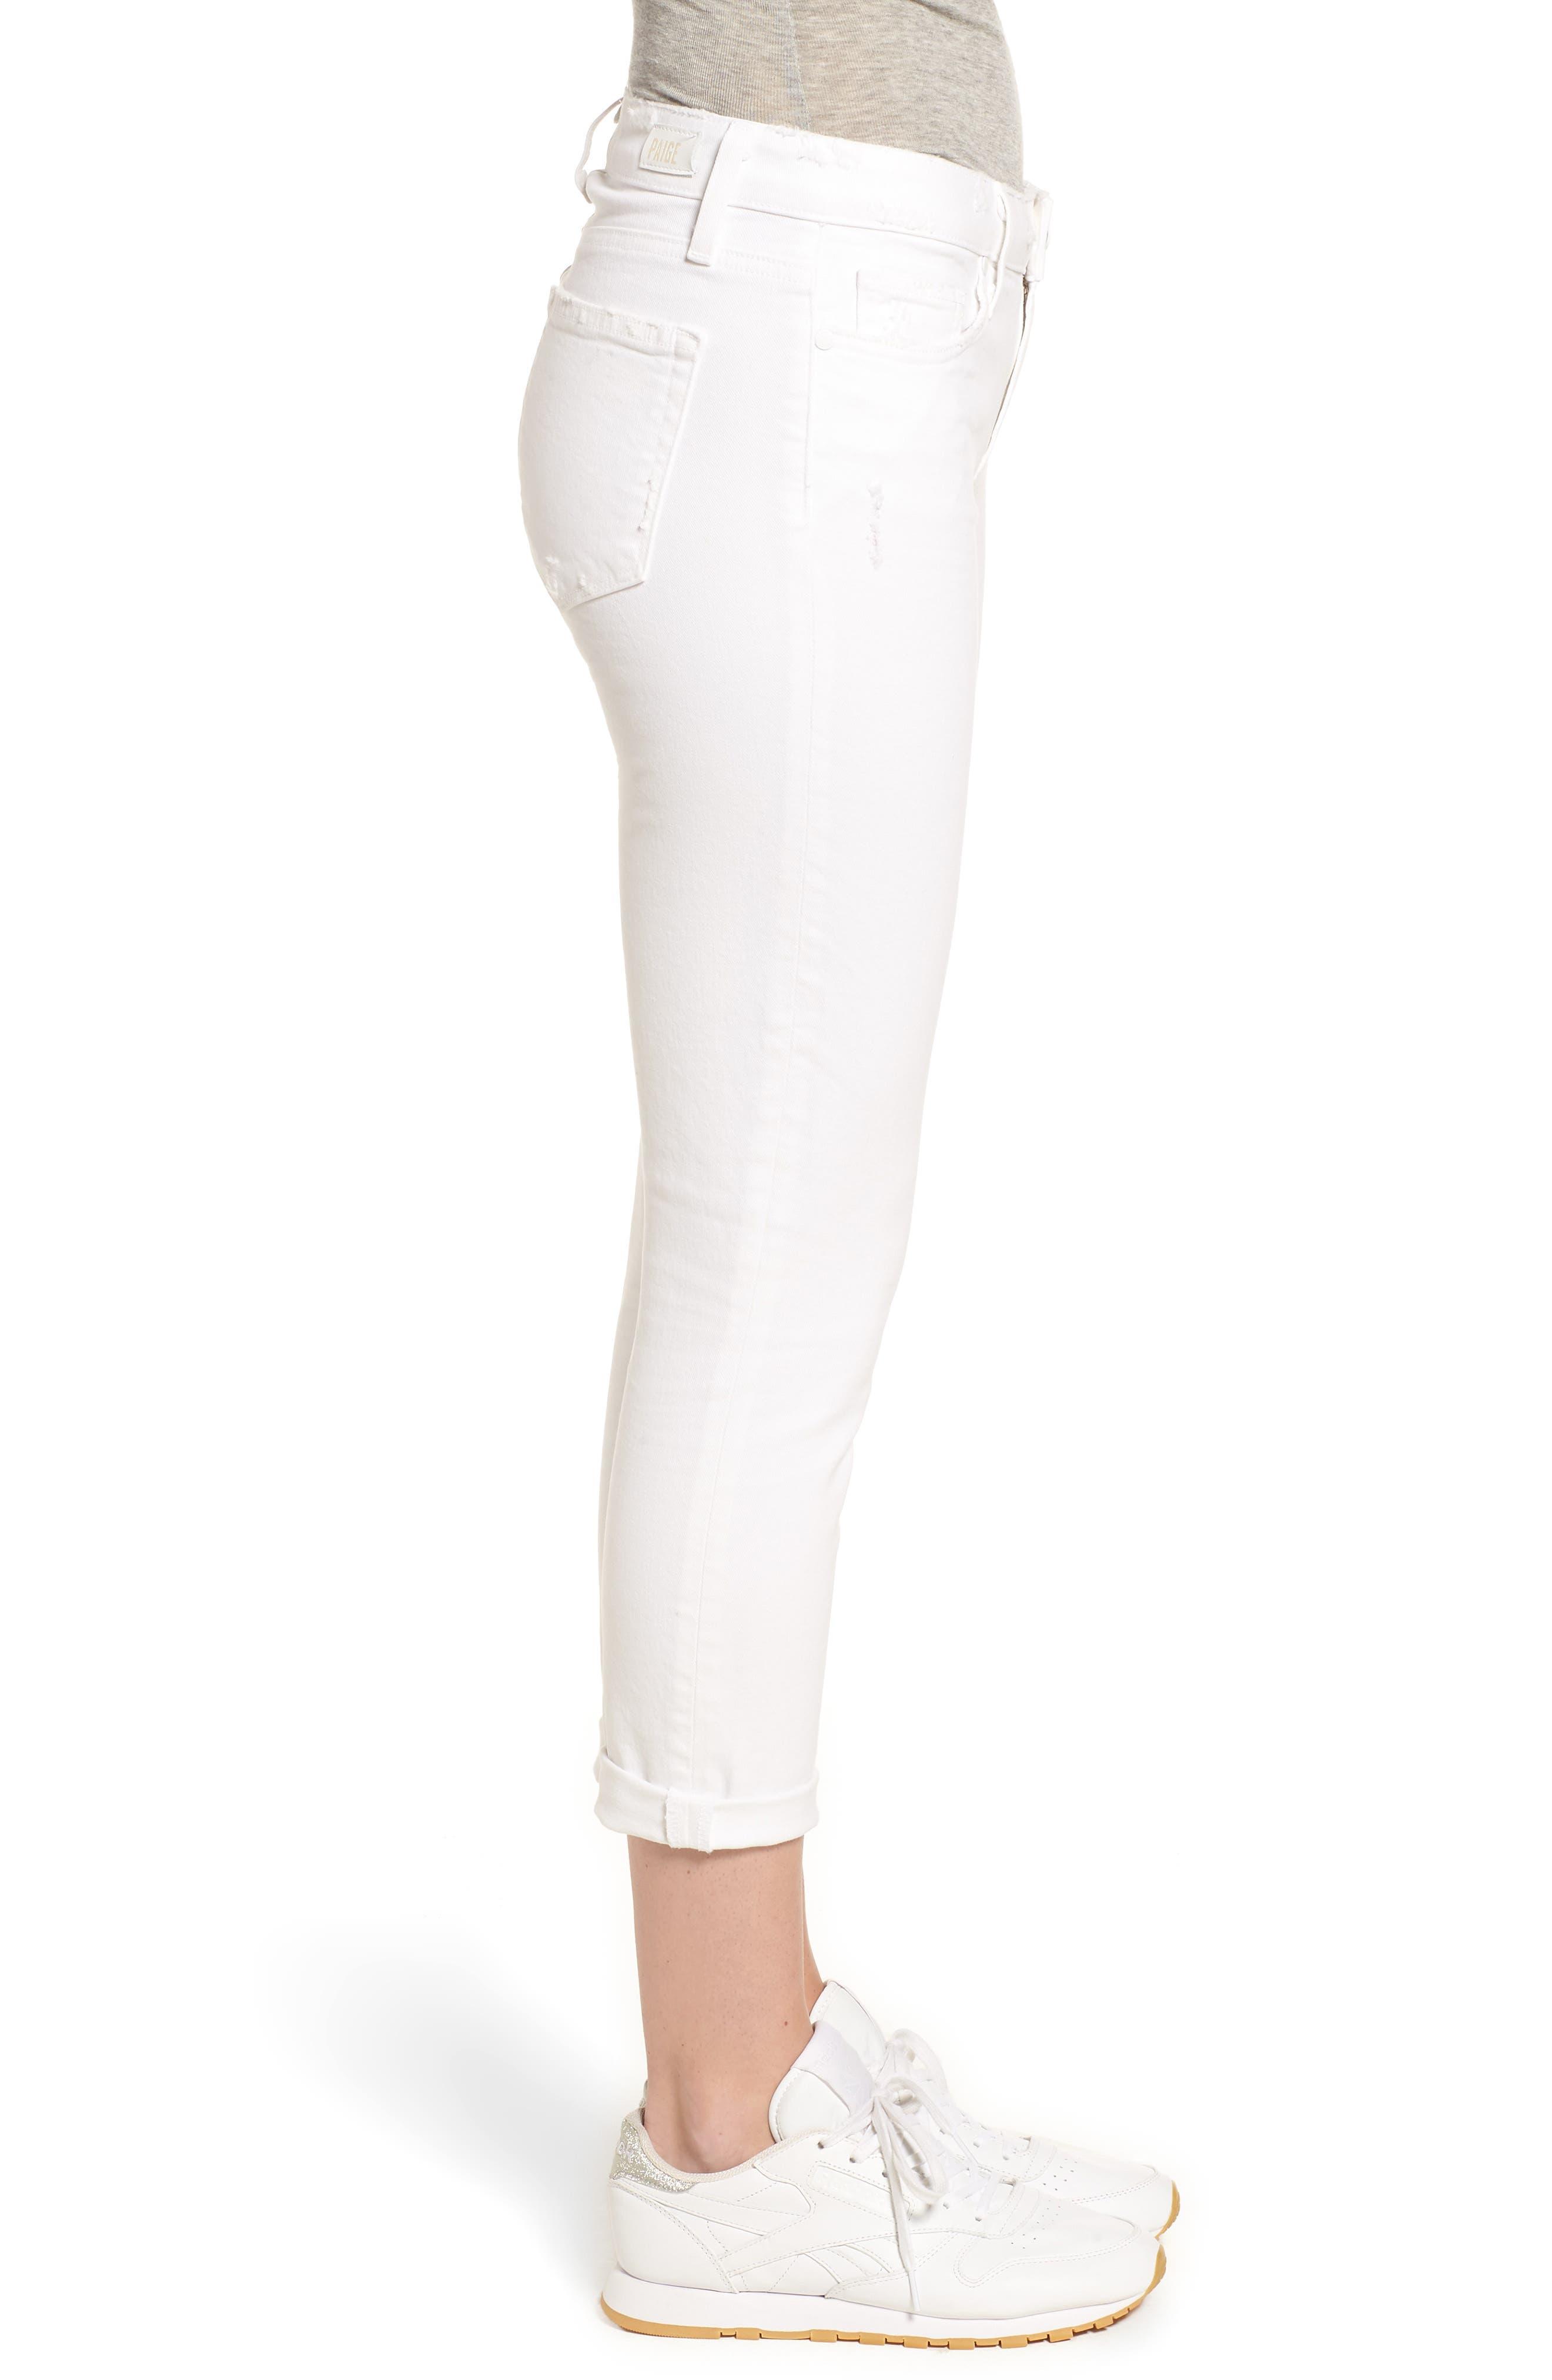 Skyline Raw Hem Crop Skinny Jeans,                             Alternate thumbnail 3, color,                             LIVED IN CRISP WHITE